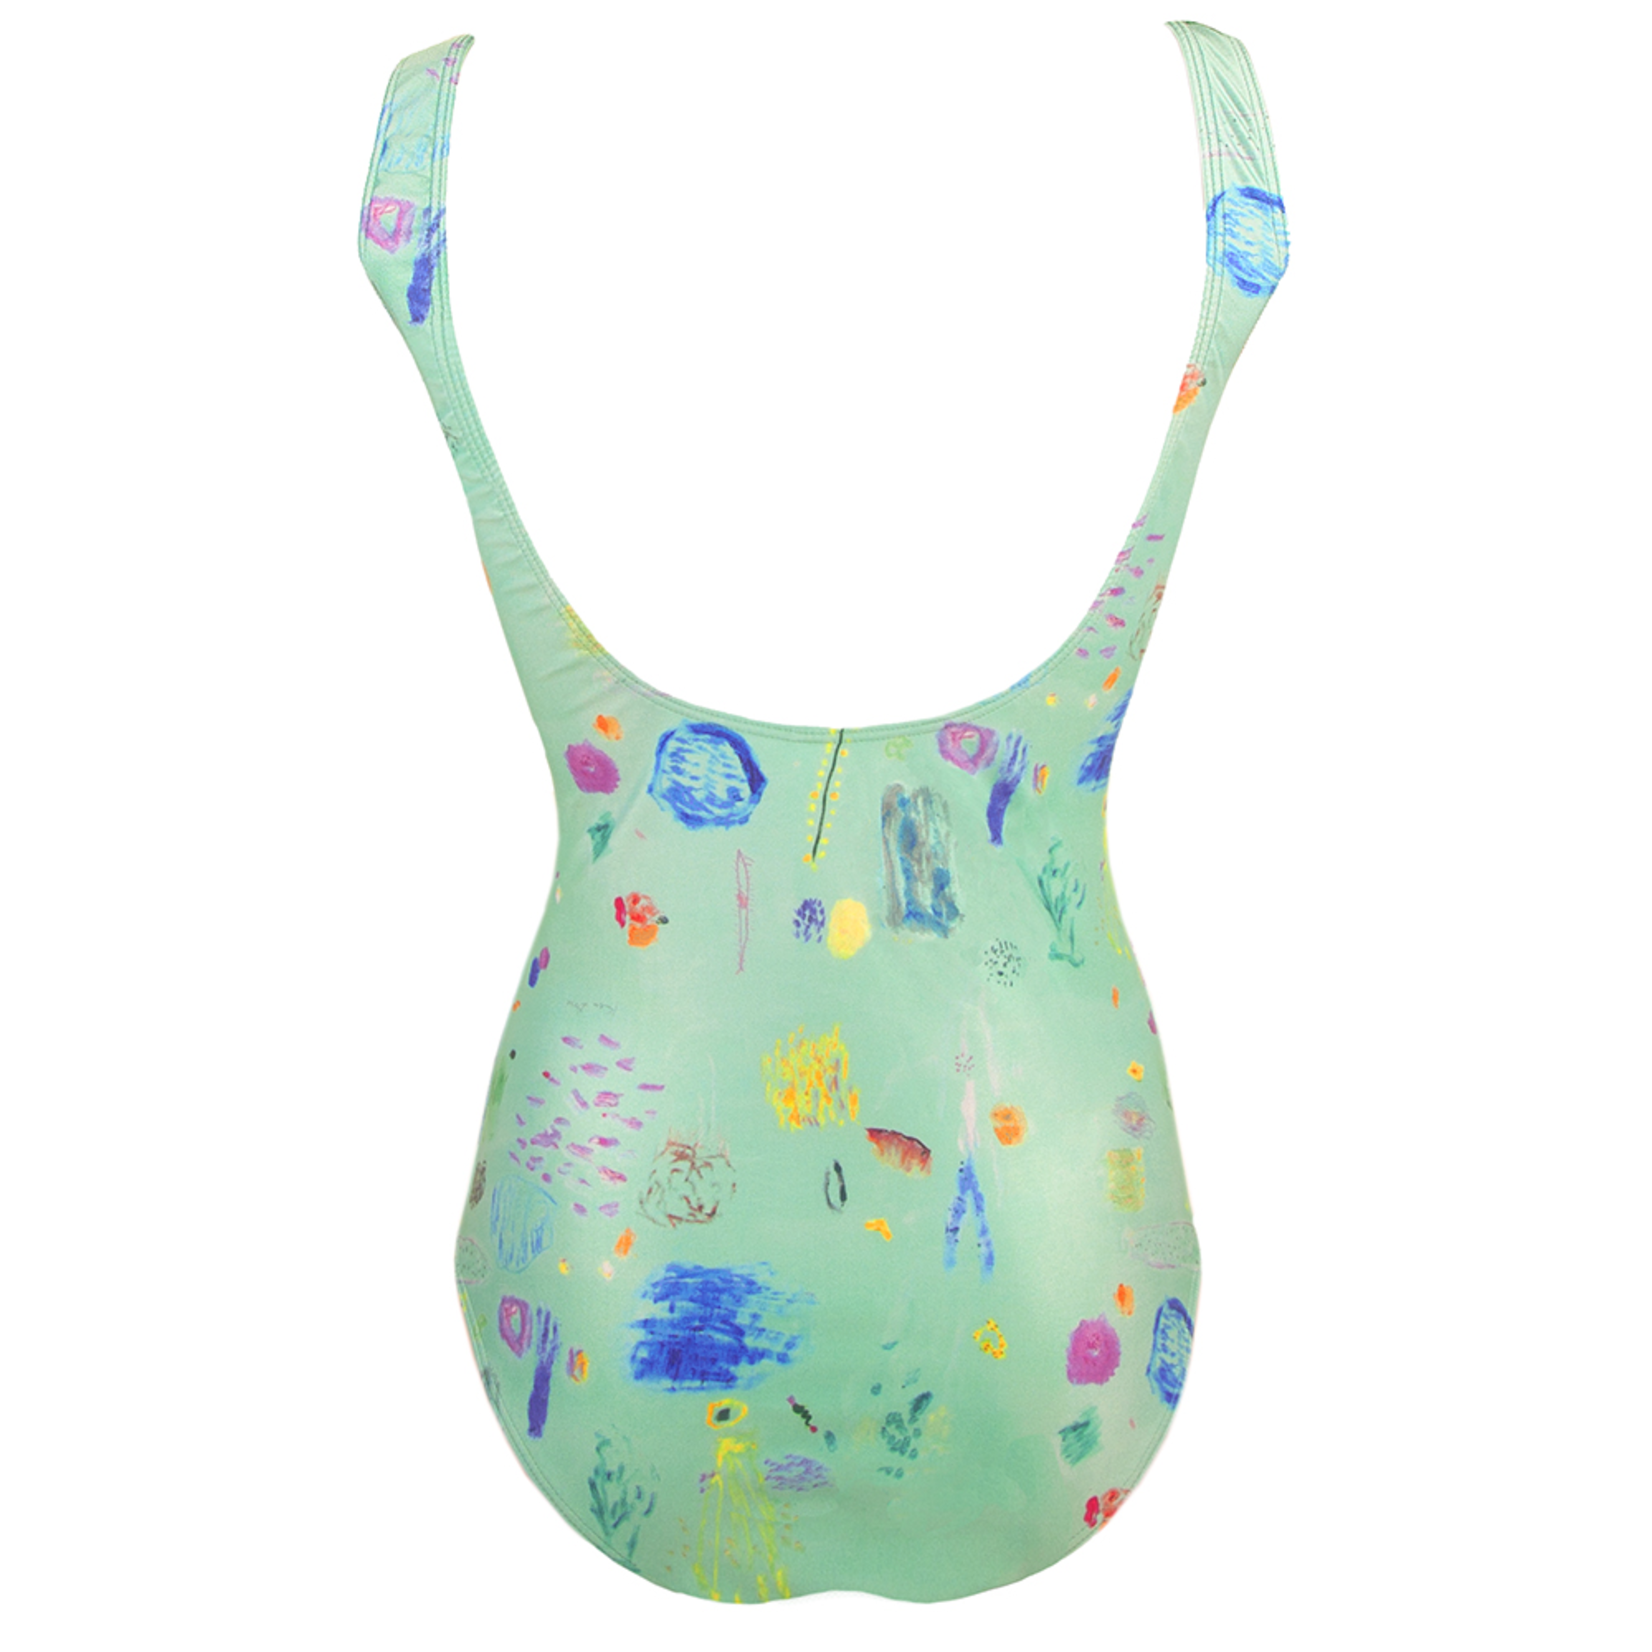 Clothing Swimwear - See 3